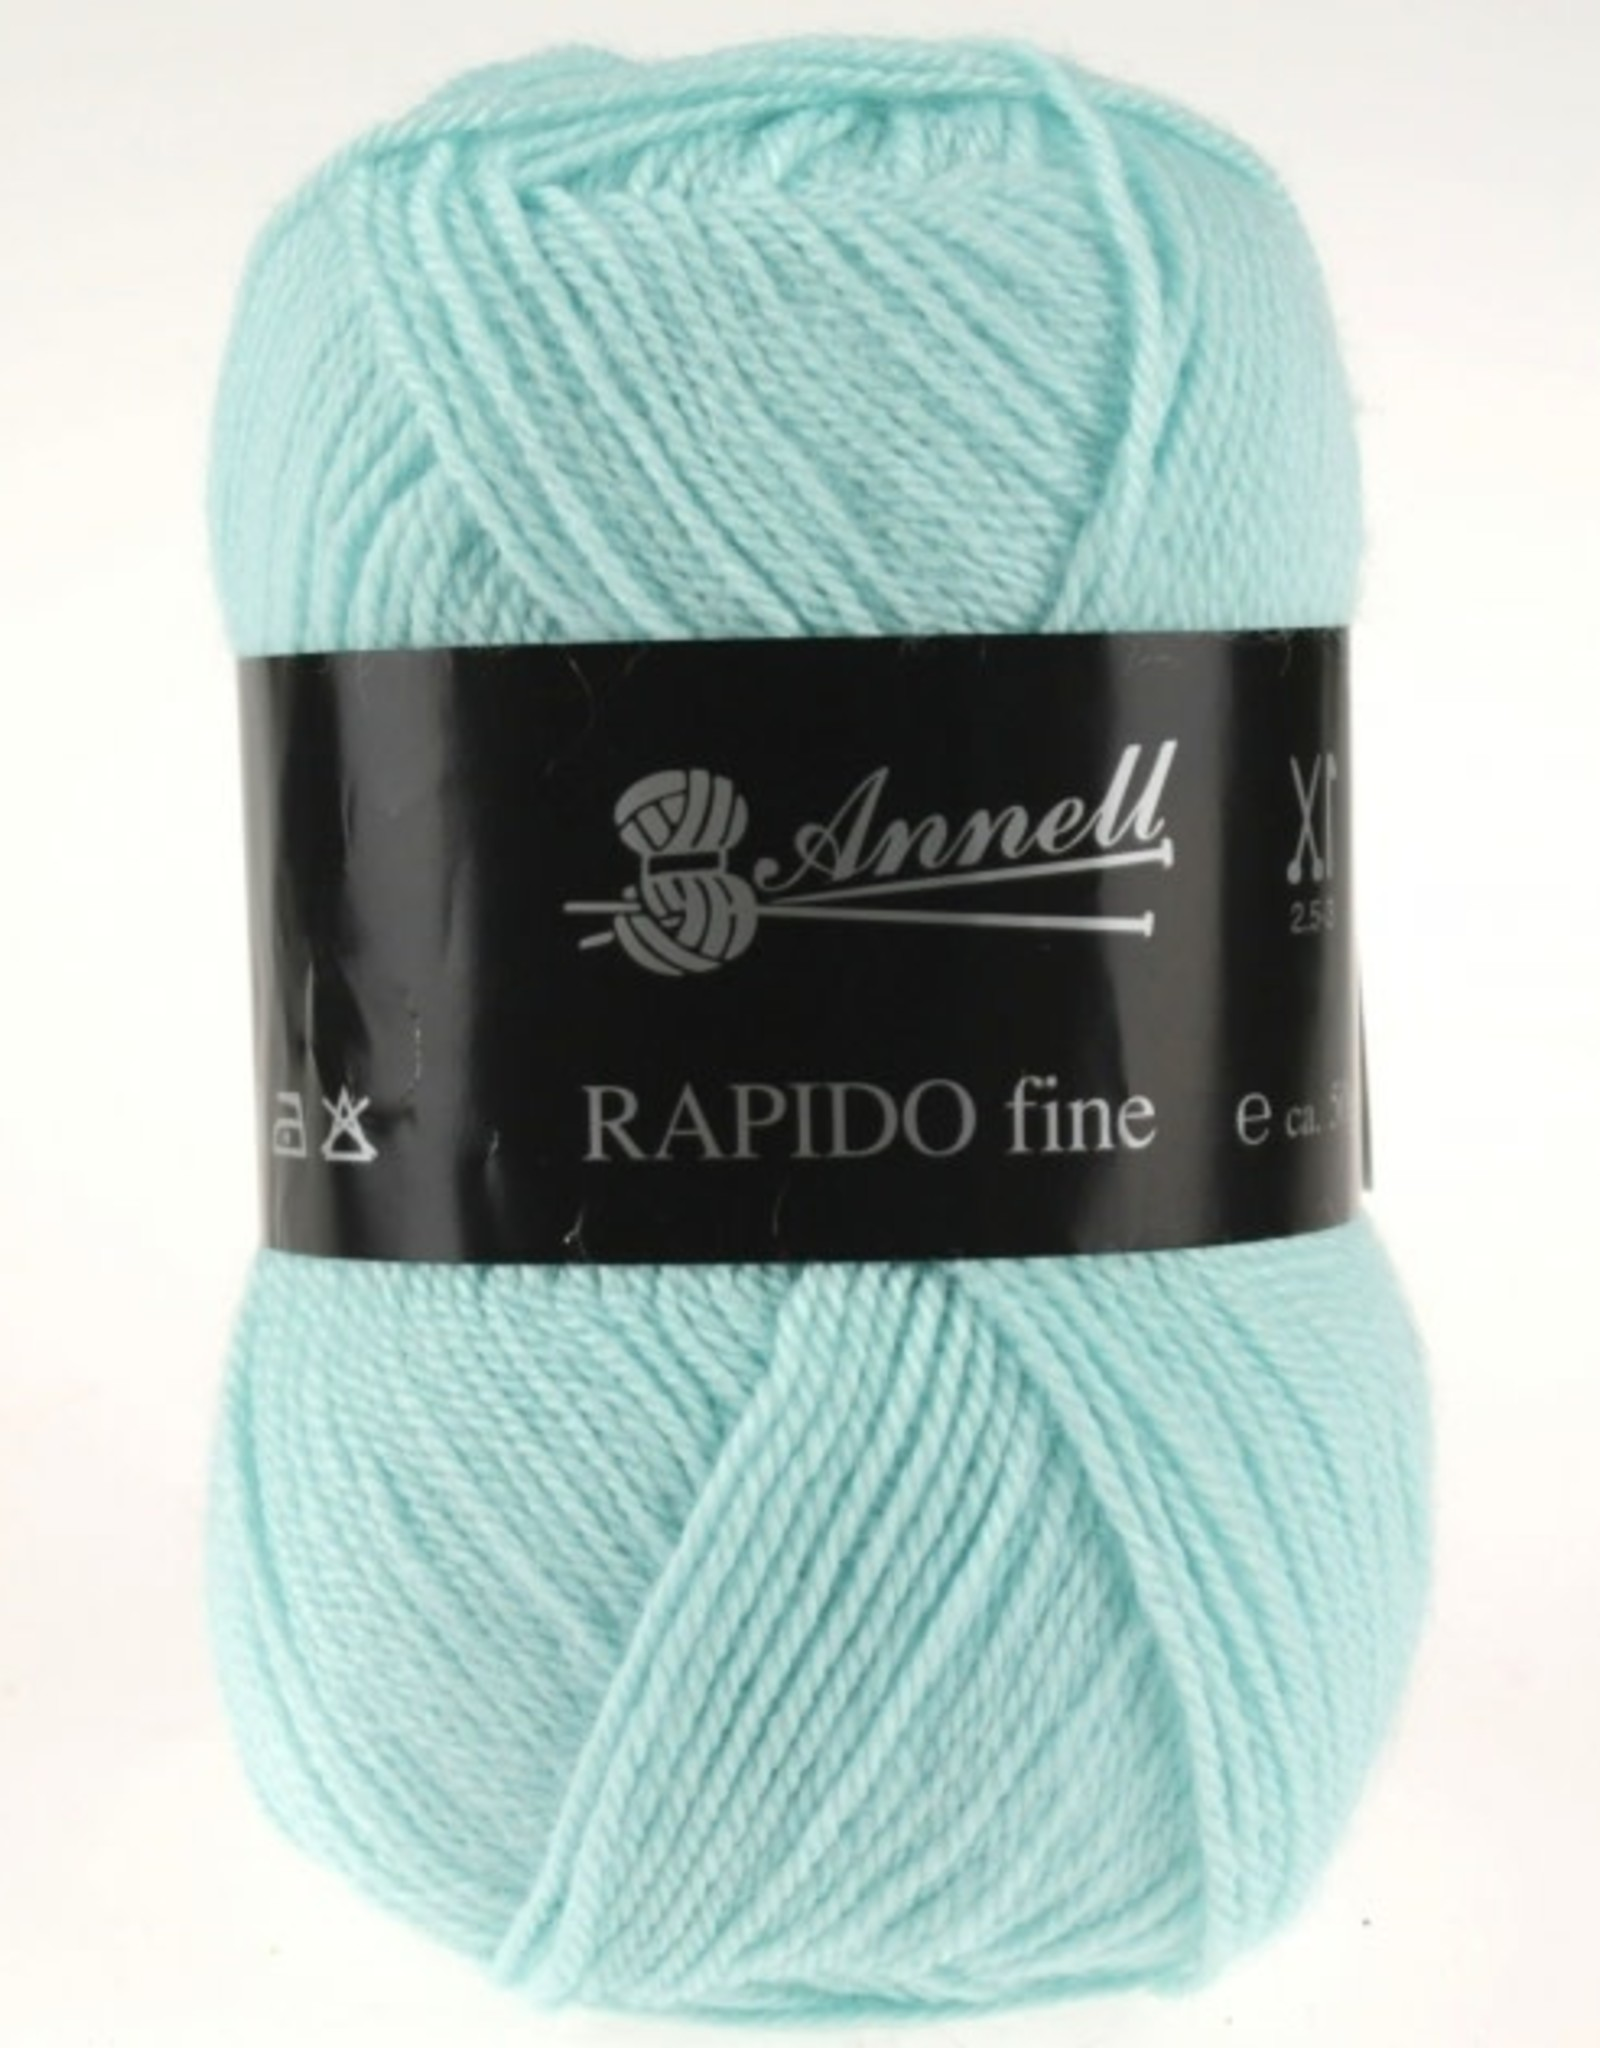 Annell Annell rapido fine 8222